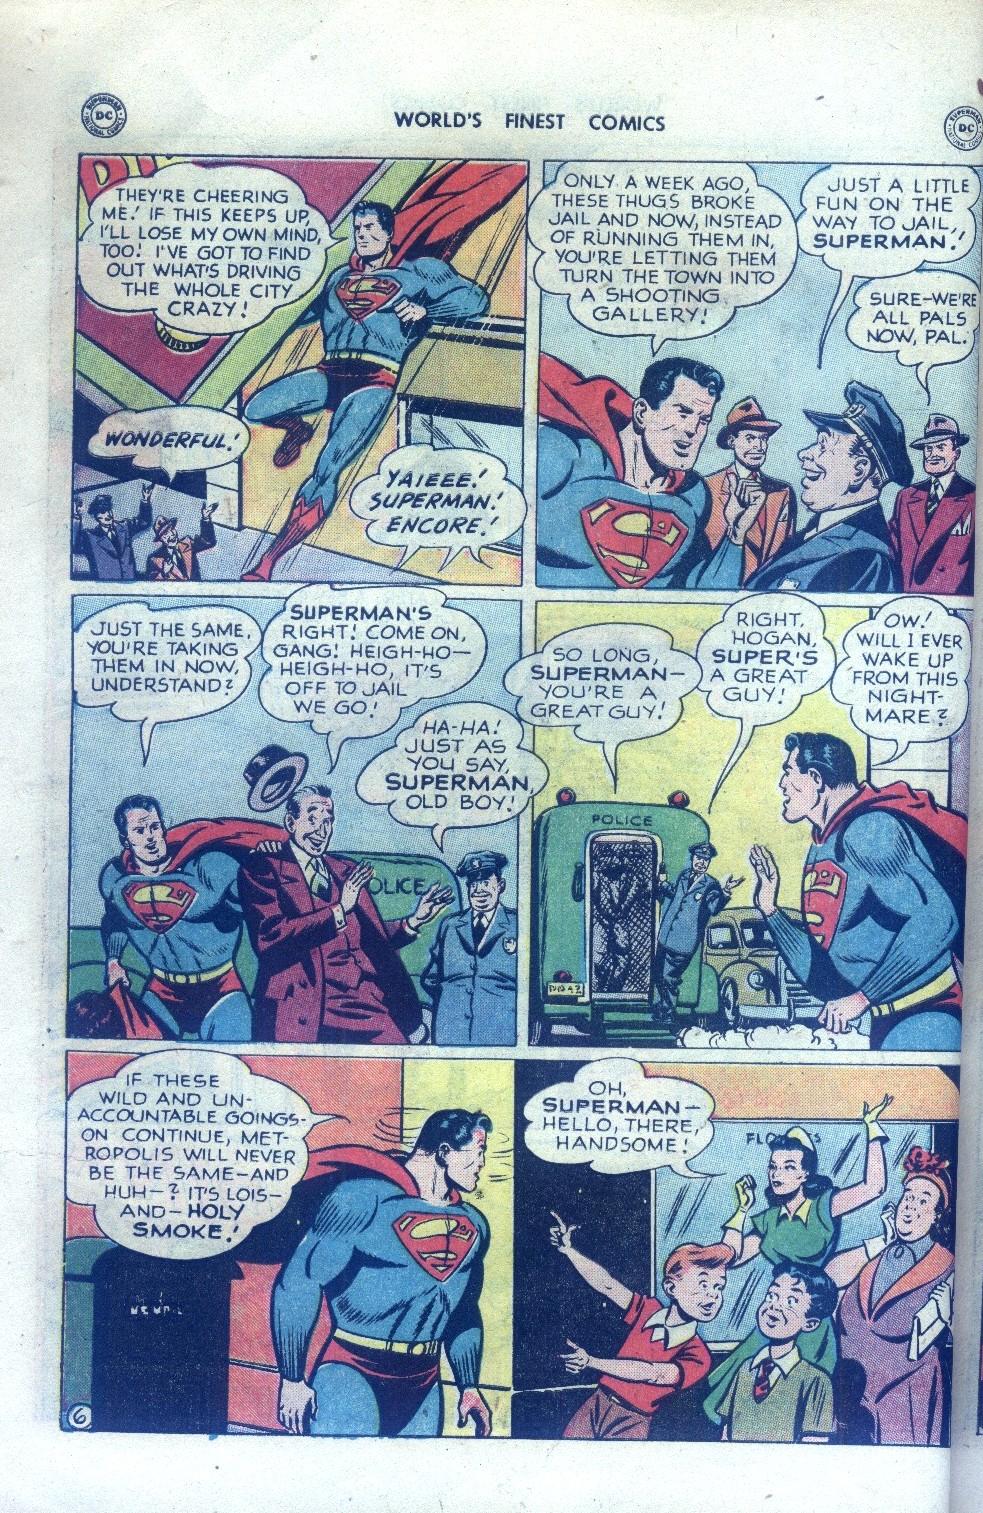 Read online World's Finest Comics comic -  Issue #43 - 8